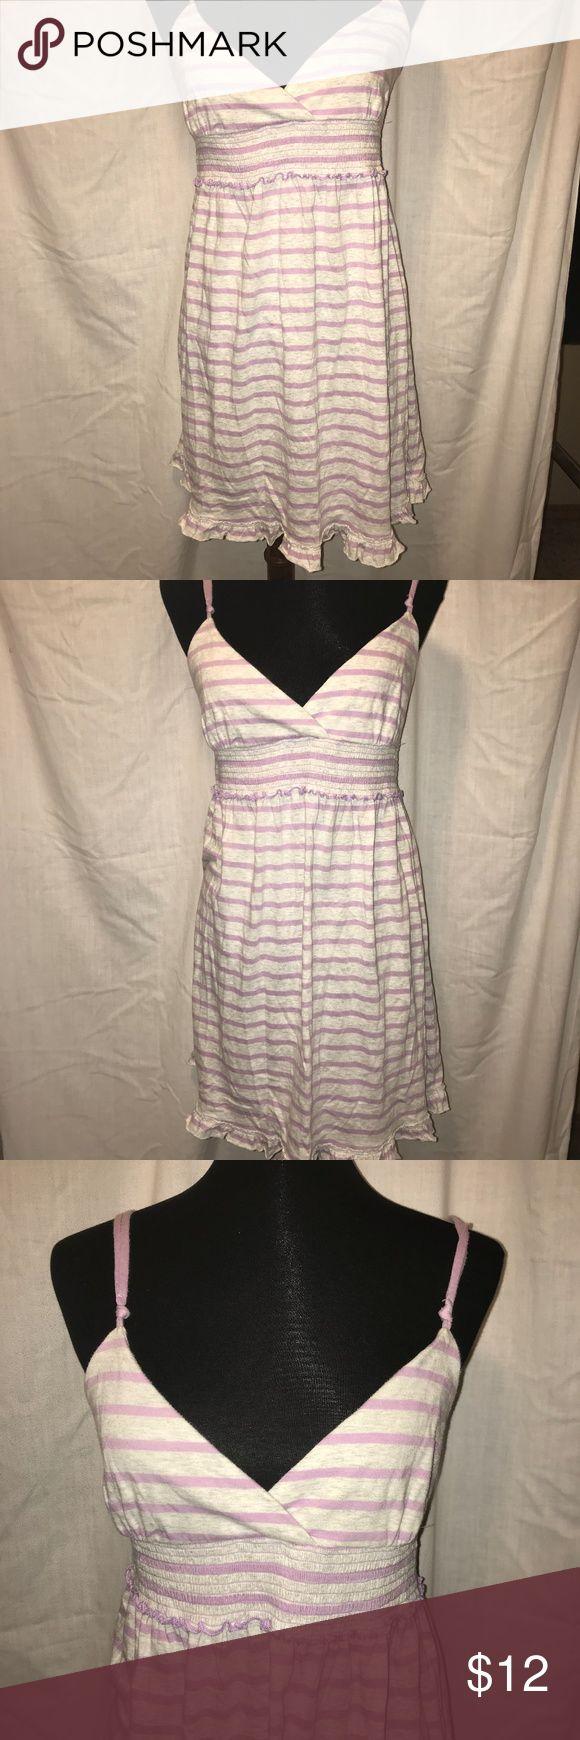 VS Pink Lilac and Light Gray Striped Dress Like new, spaghetti adjustable straps. Pale purple on light gray background. Ruffle hem. Smocked waist. Lightweight cute and comfy PINK Dresses Mini